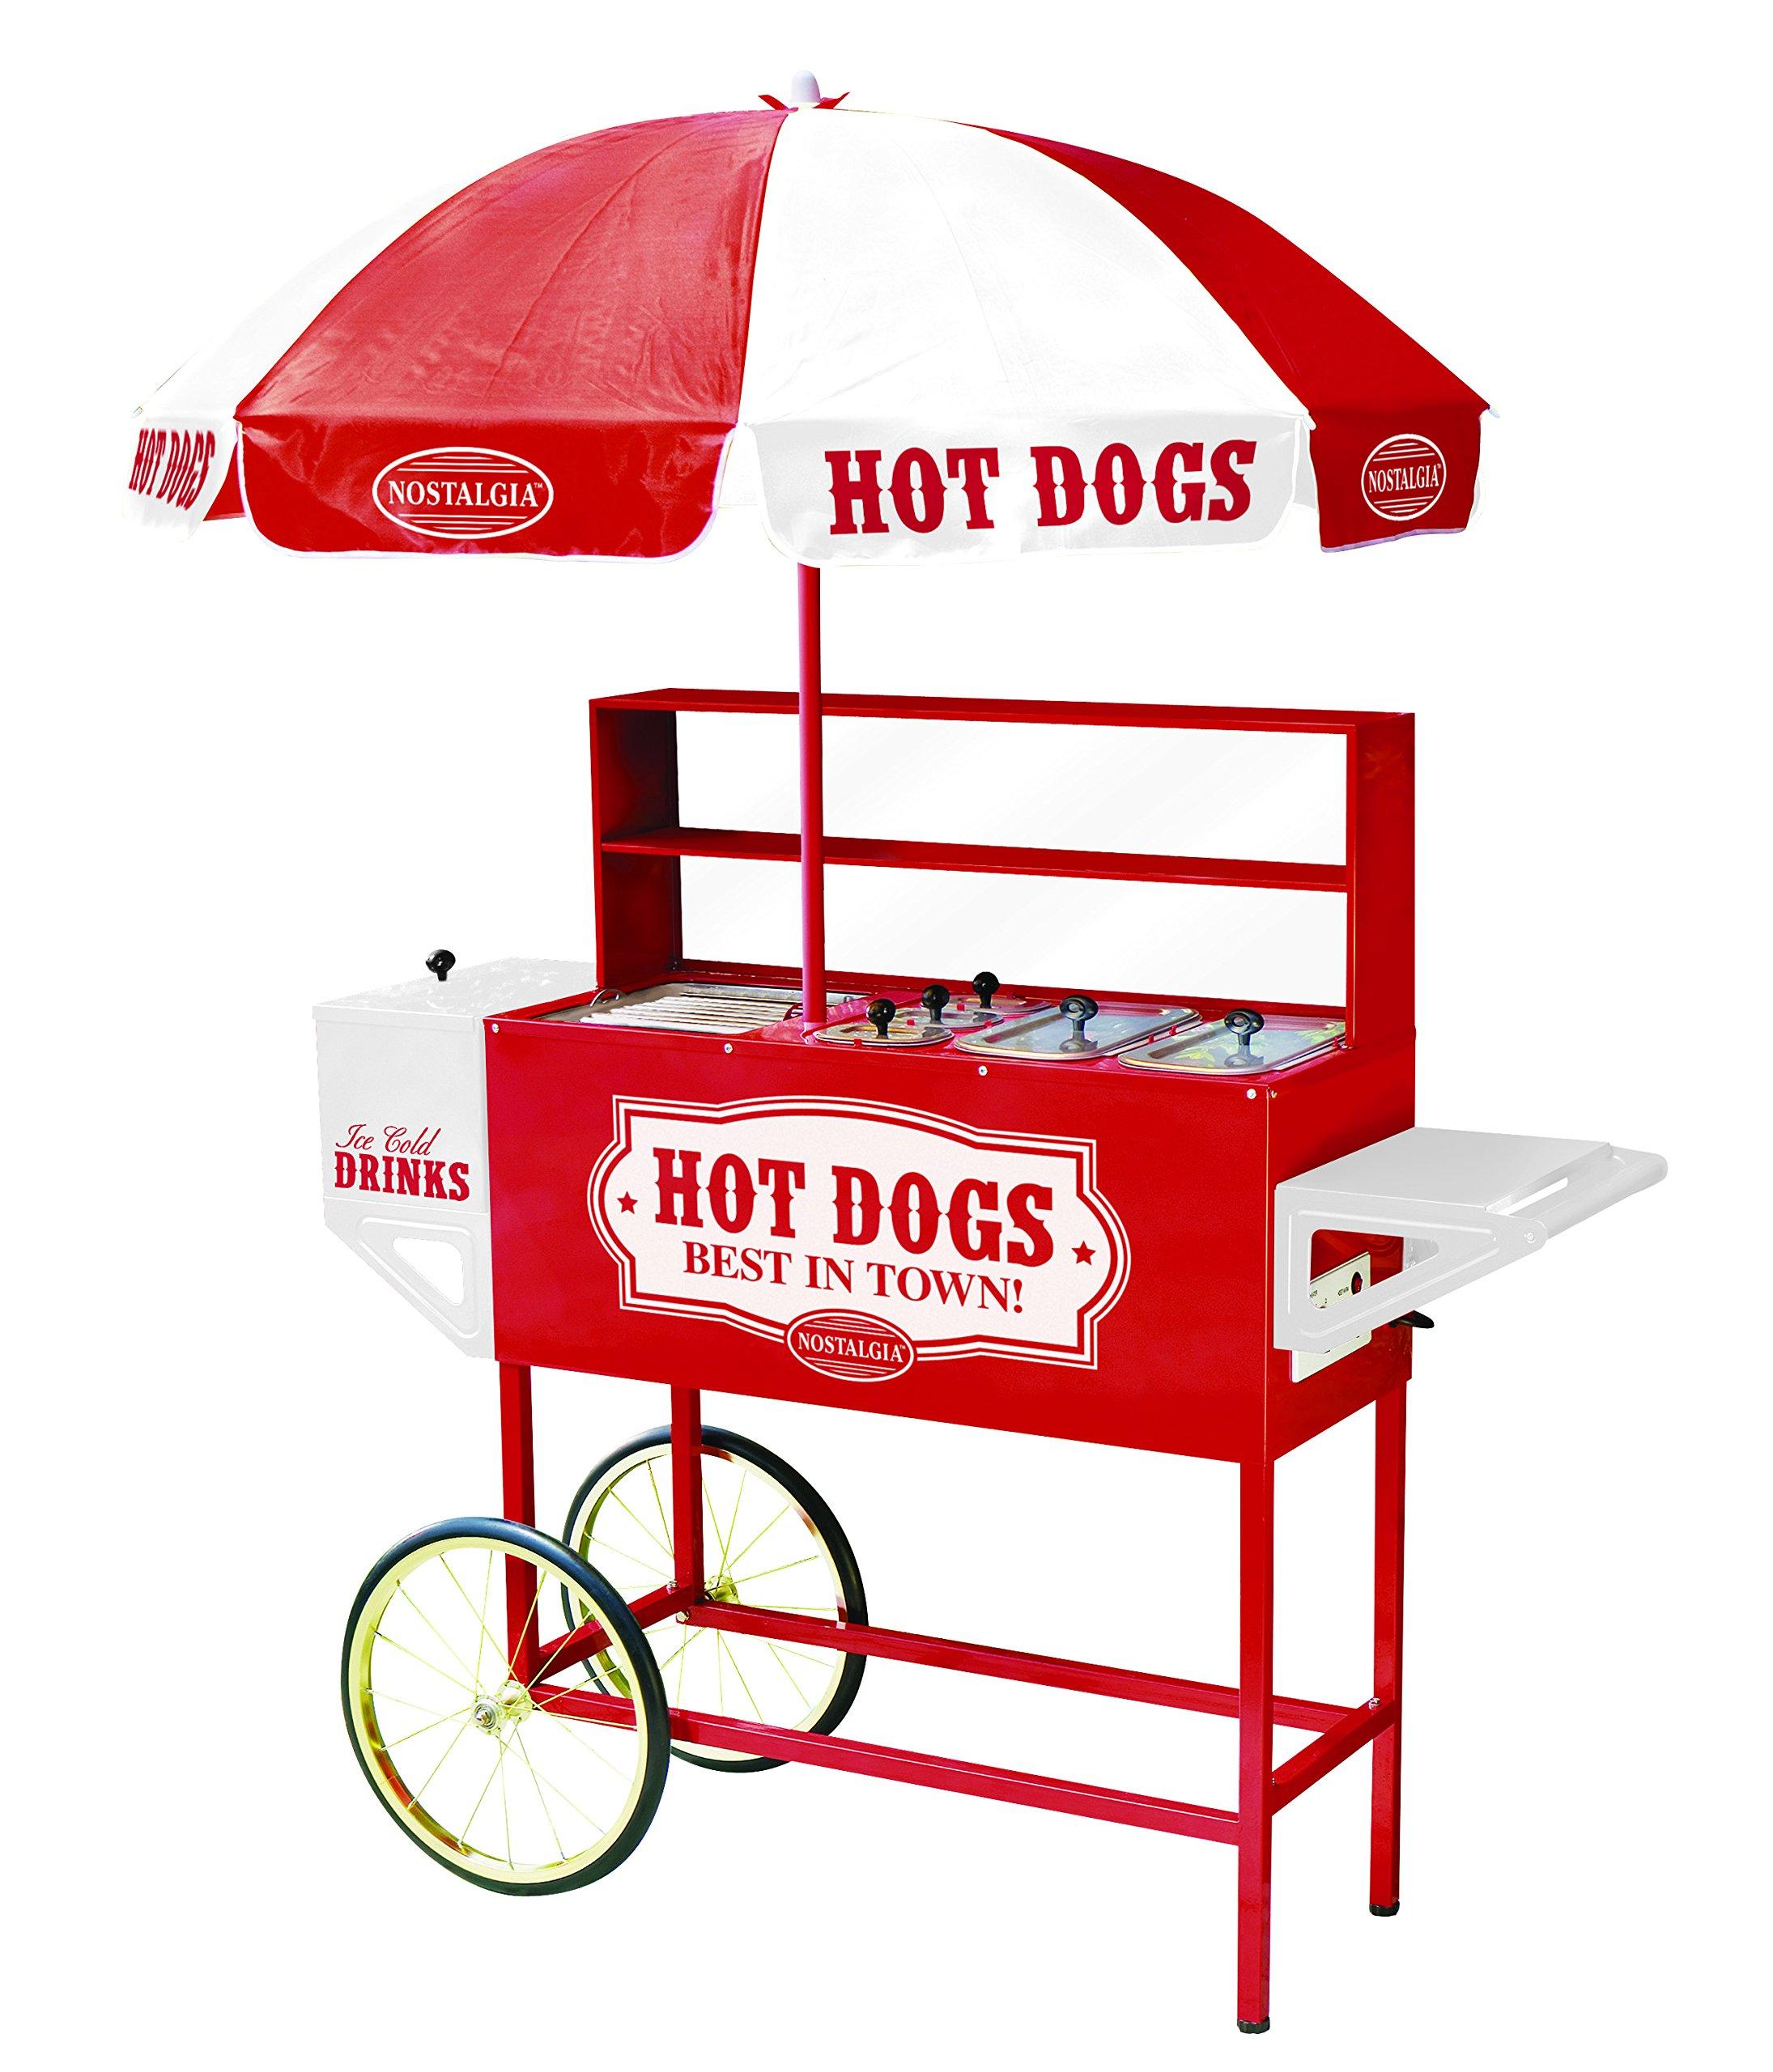 Nostalgia HDC701 48-Inch Hot Dog Vending Cart by Nostalgia